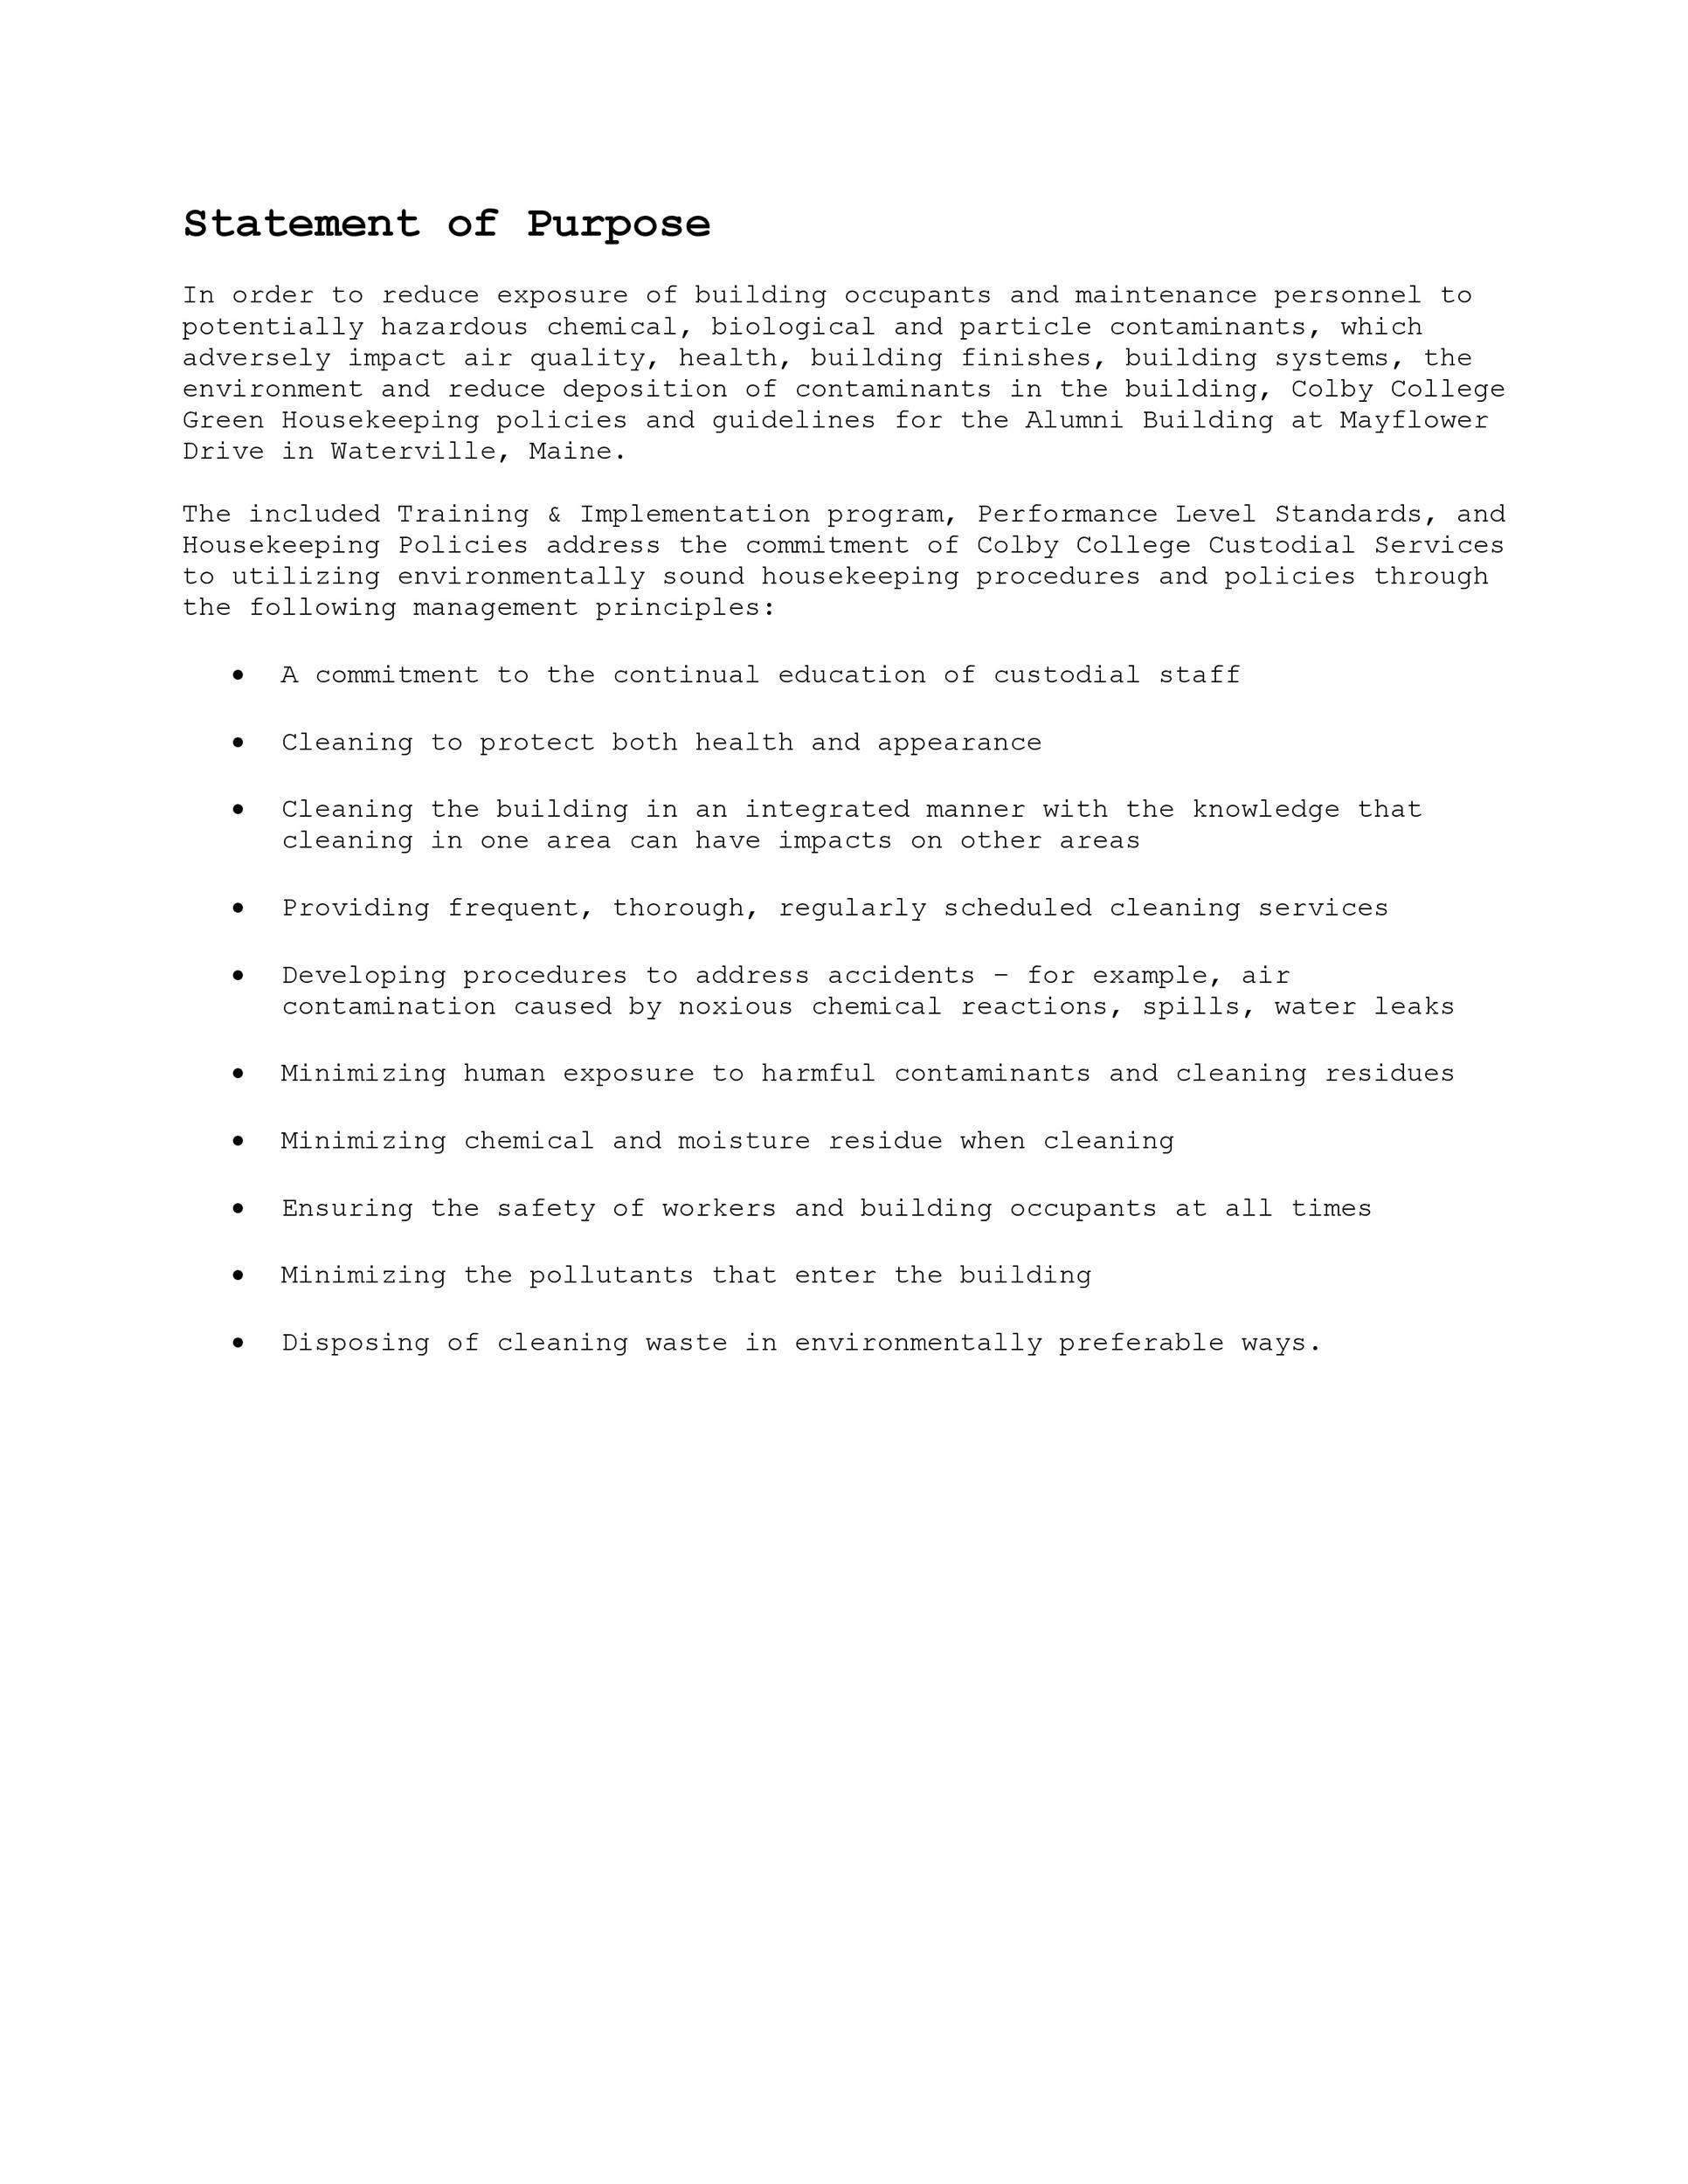 Free statement of purpose example 35